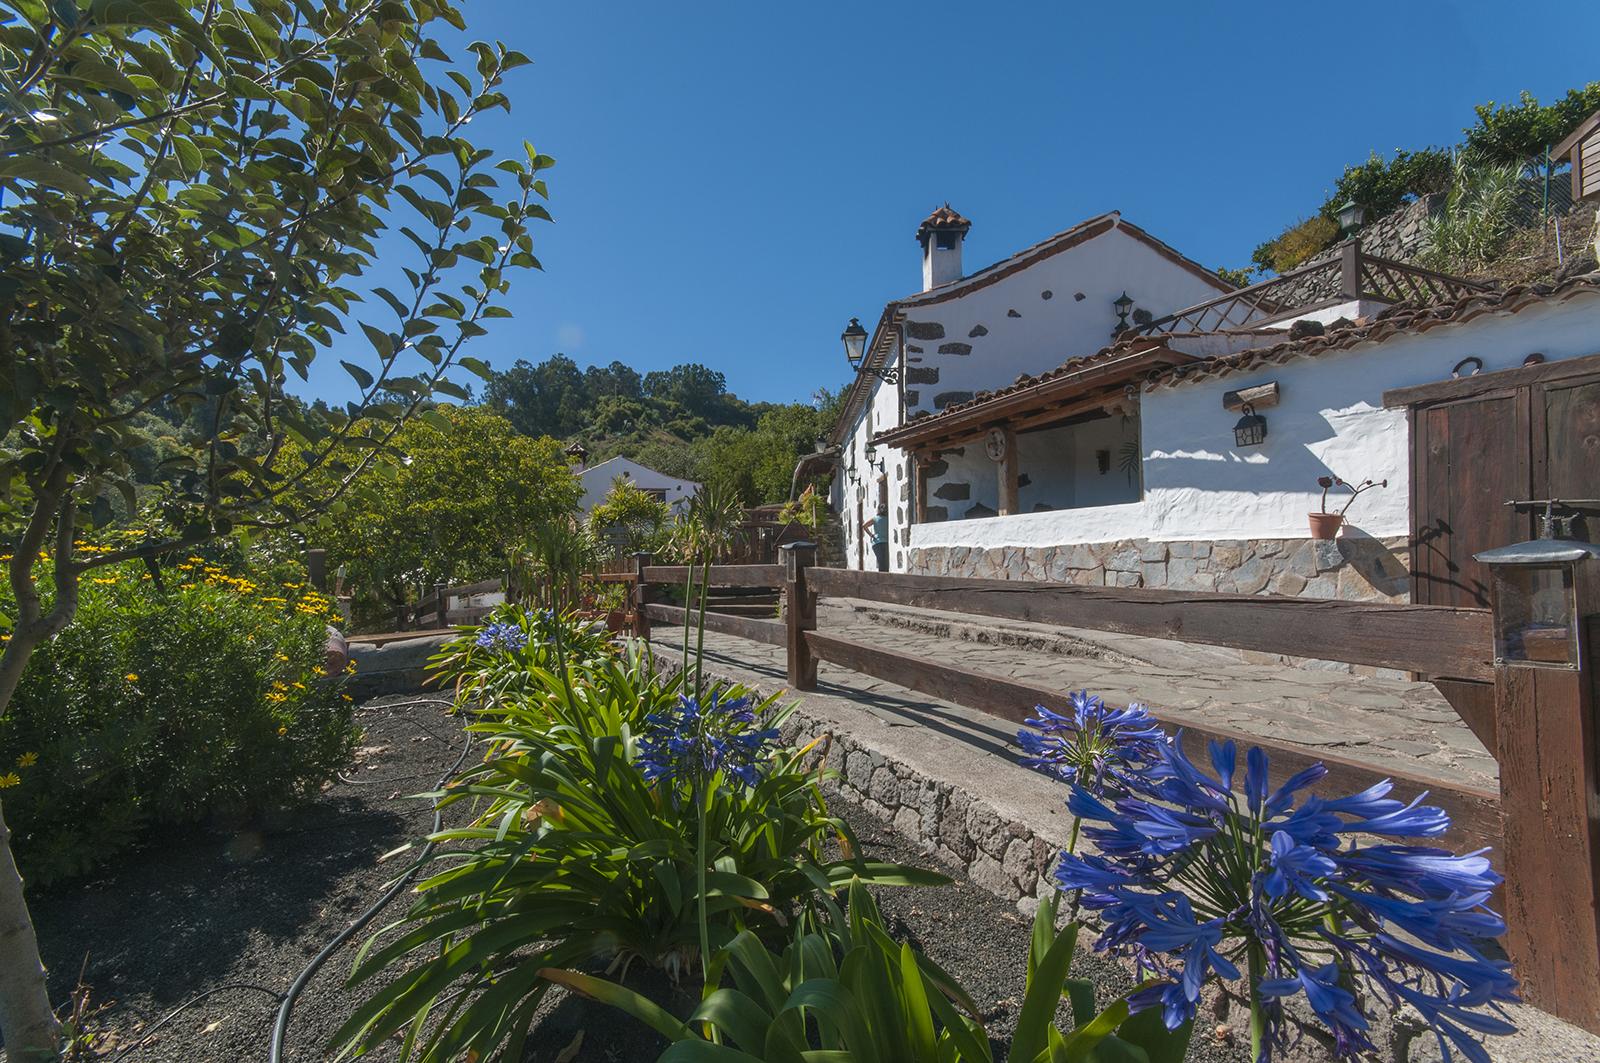 ferienhaus las calas de valleseco b in valleseco spanien es6287 2 1 interhome. Black Bedroom Furniture Sets. Home Design Ideas